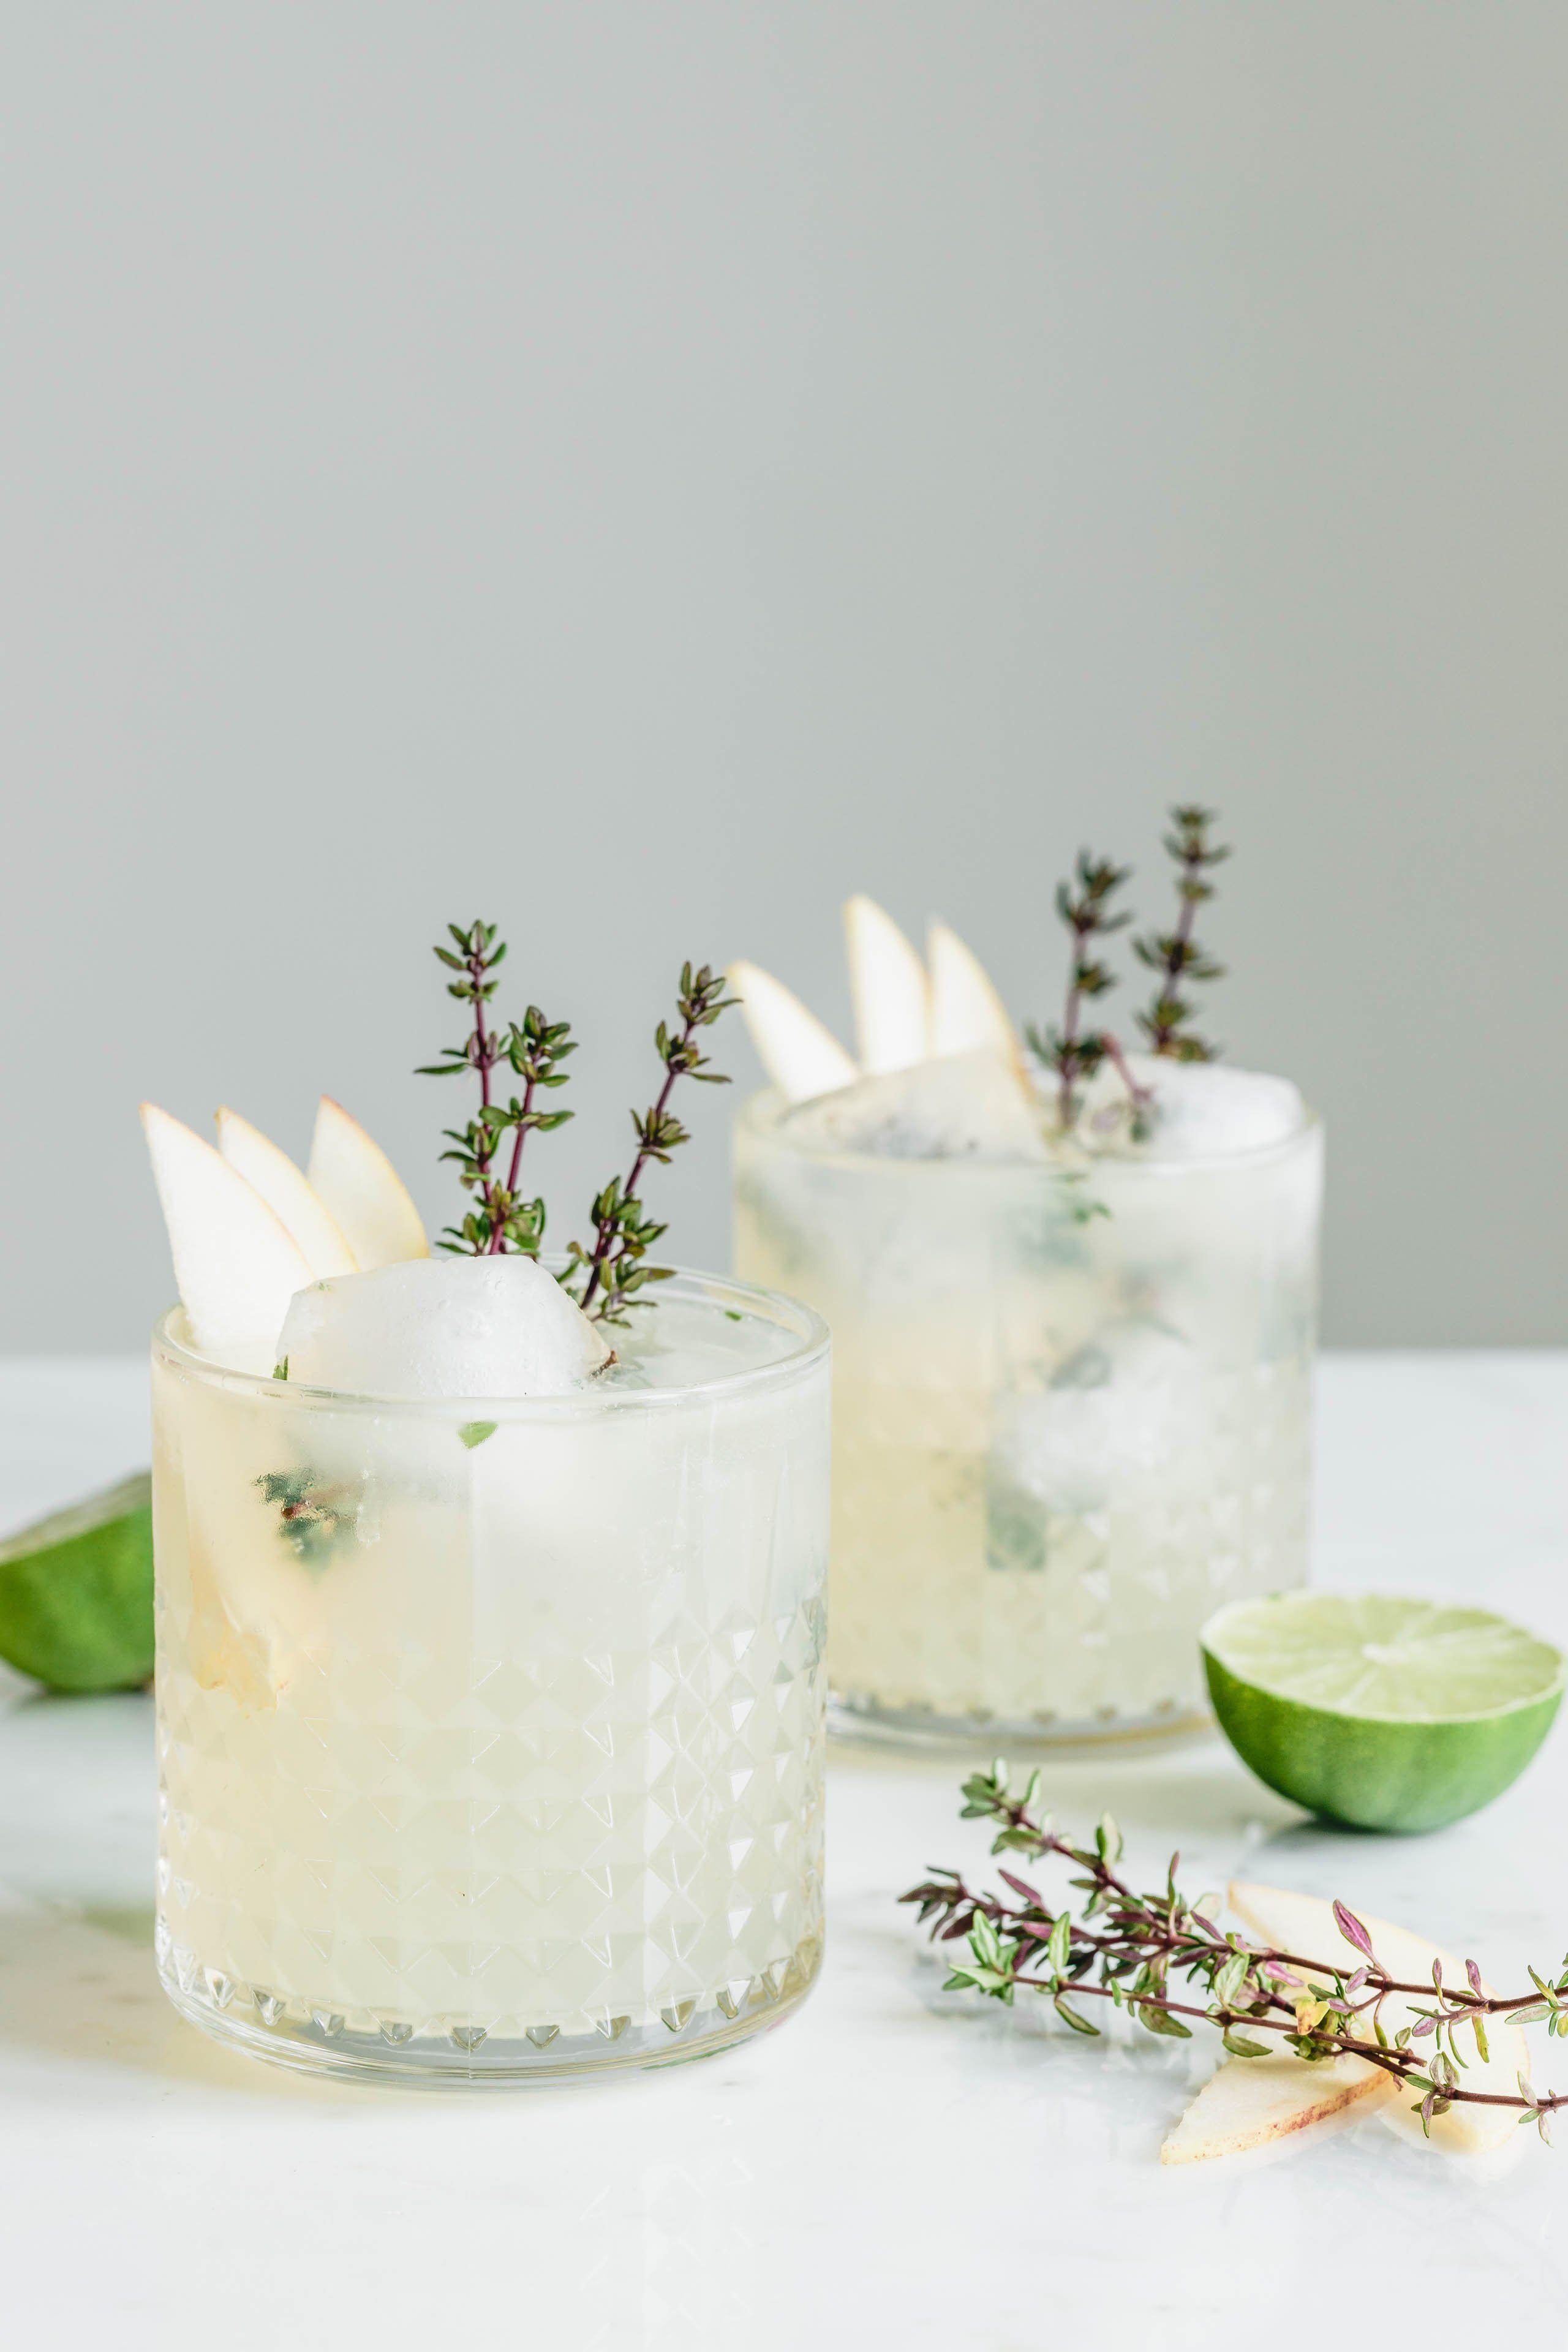 Soho Sling – Gin Cocktail mit Thymian · Eat this! Foodblog • Vegane Rezepte • Stories #kokteyltarifleri